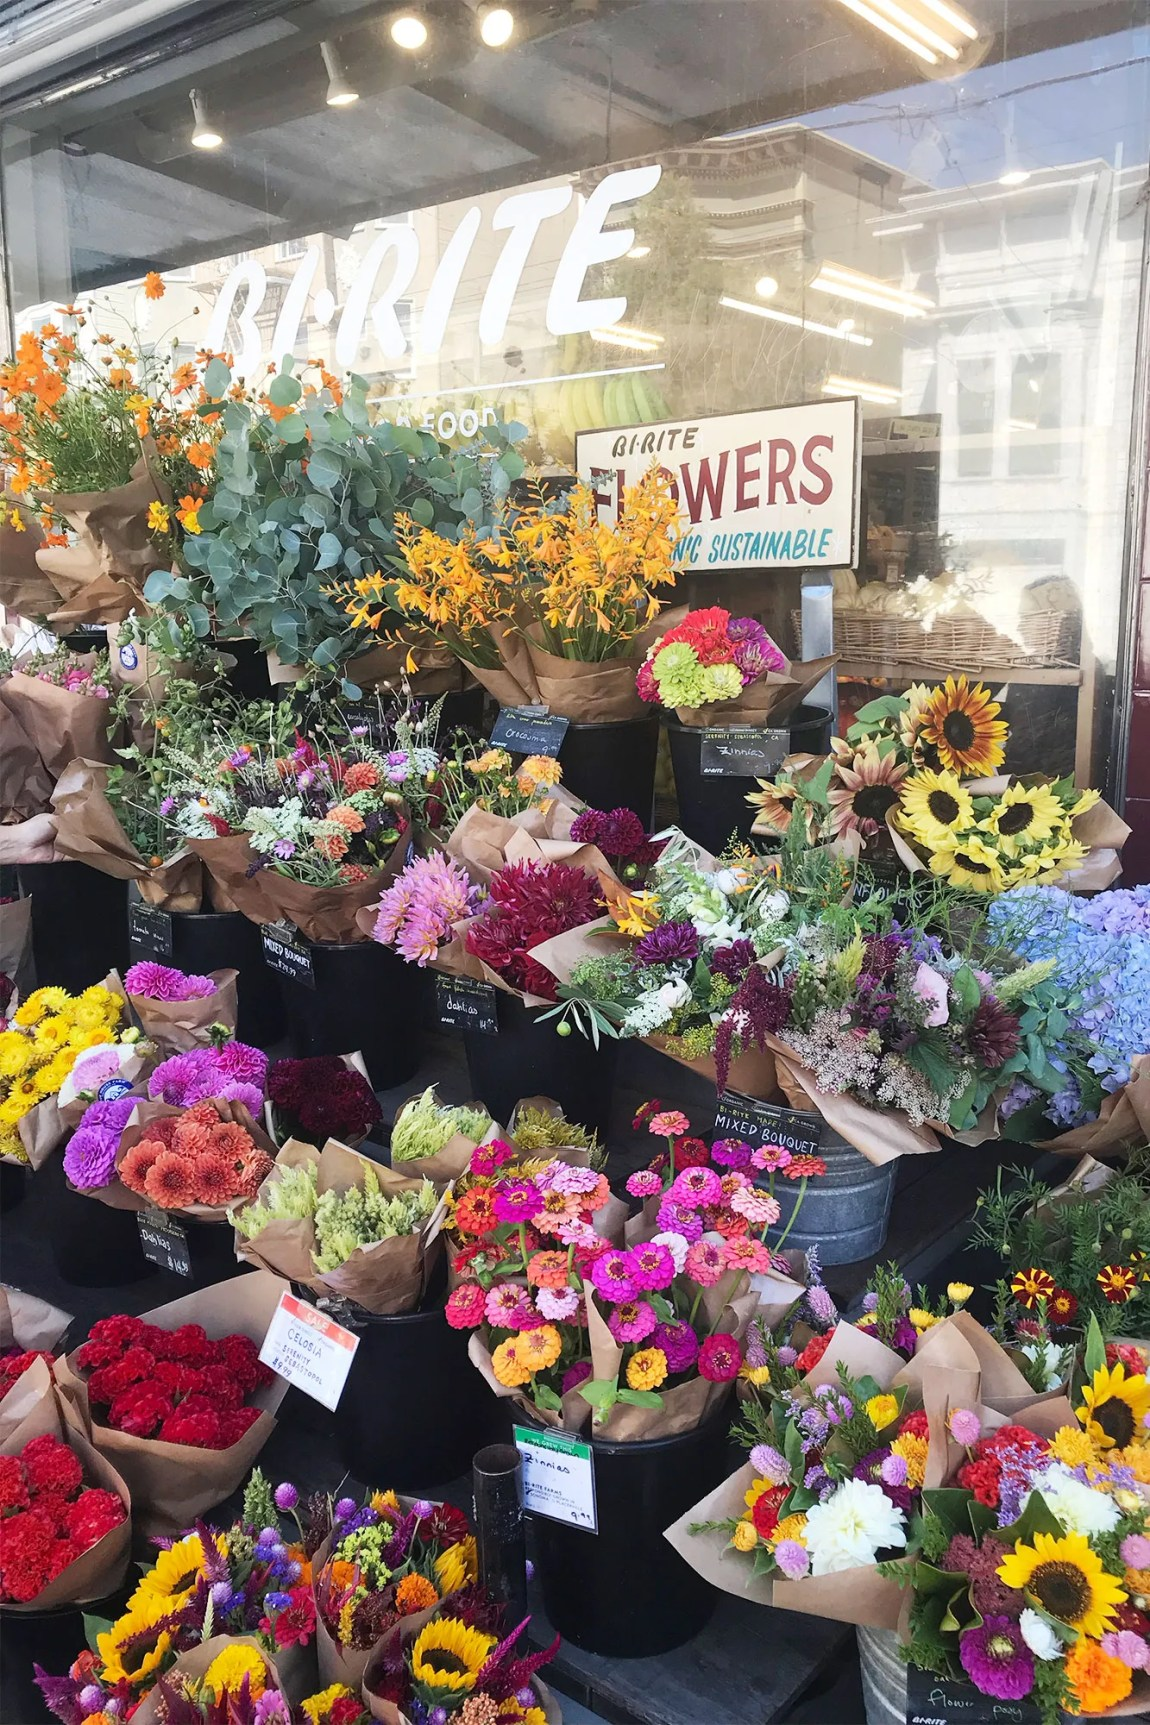 Flowers outside of the Bi-Rite